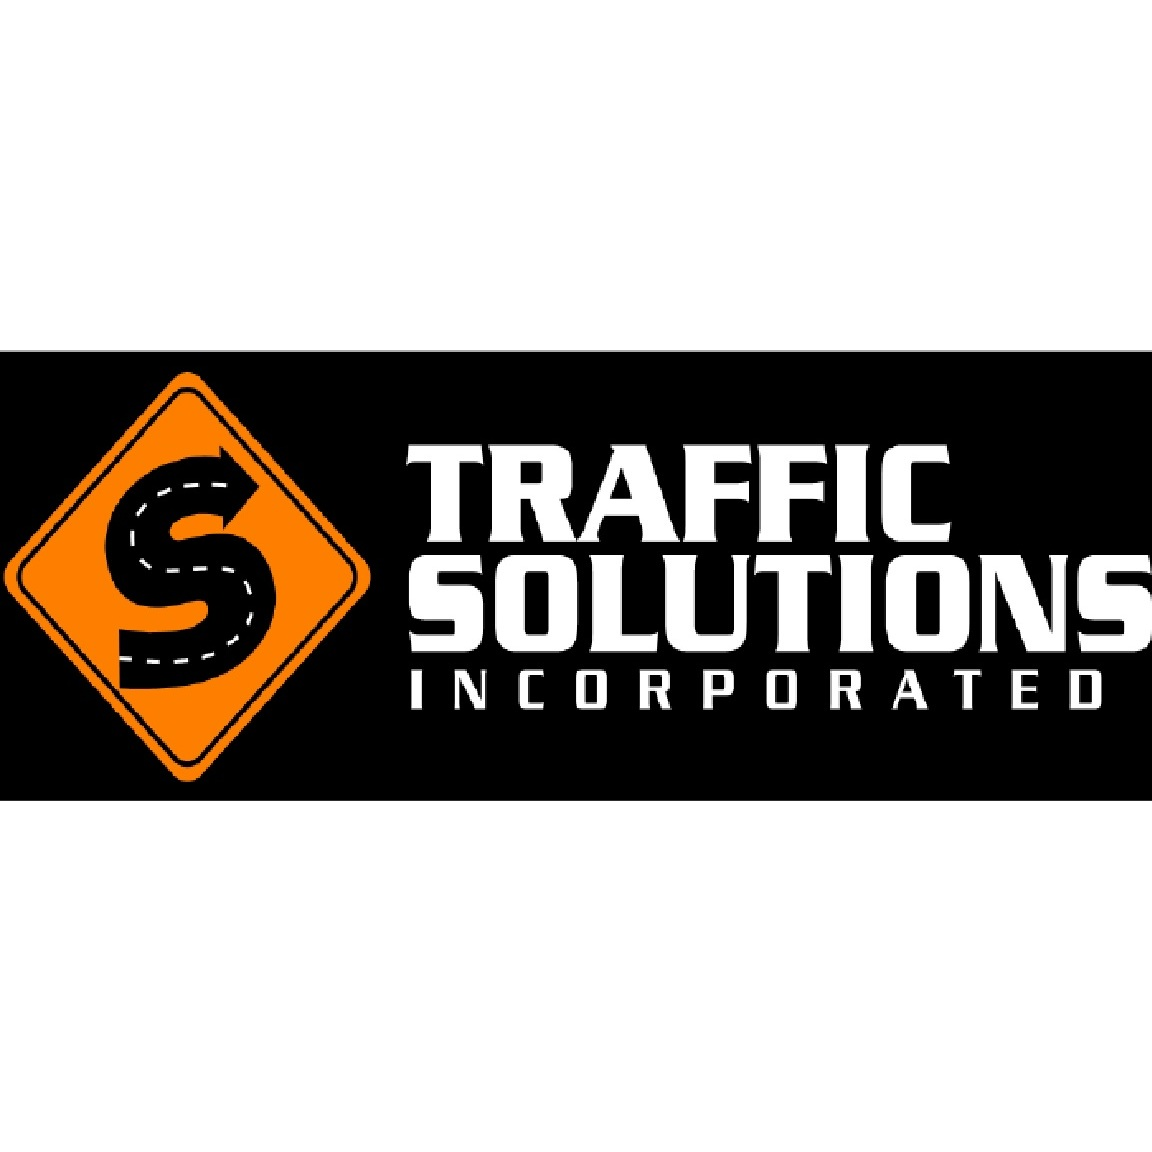 Traffic Solutions Inc